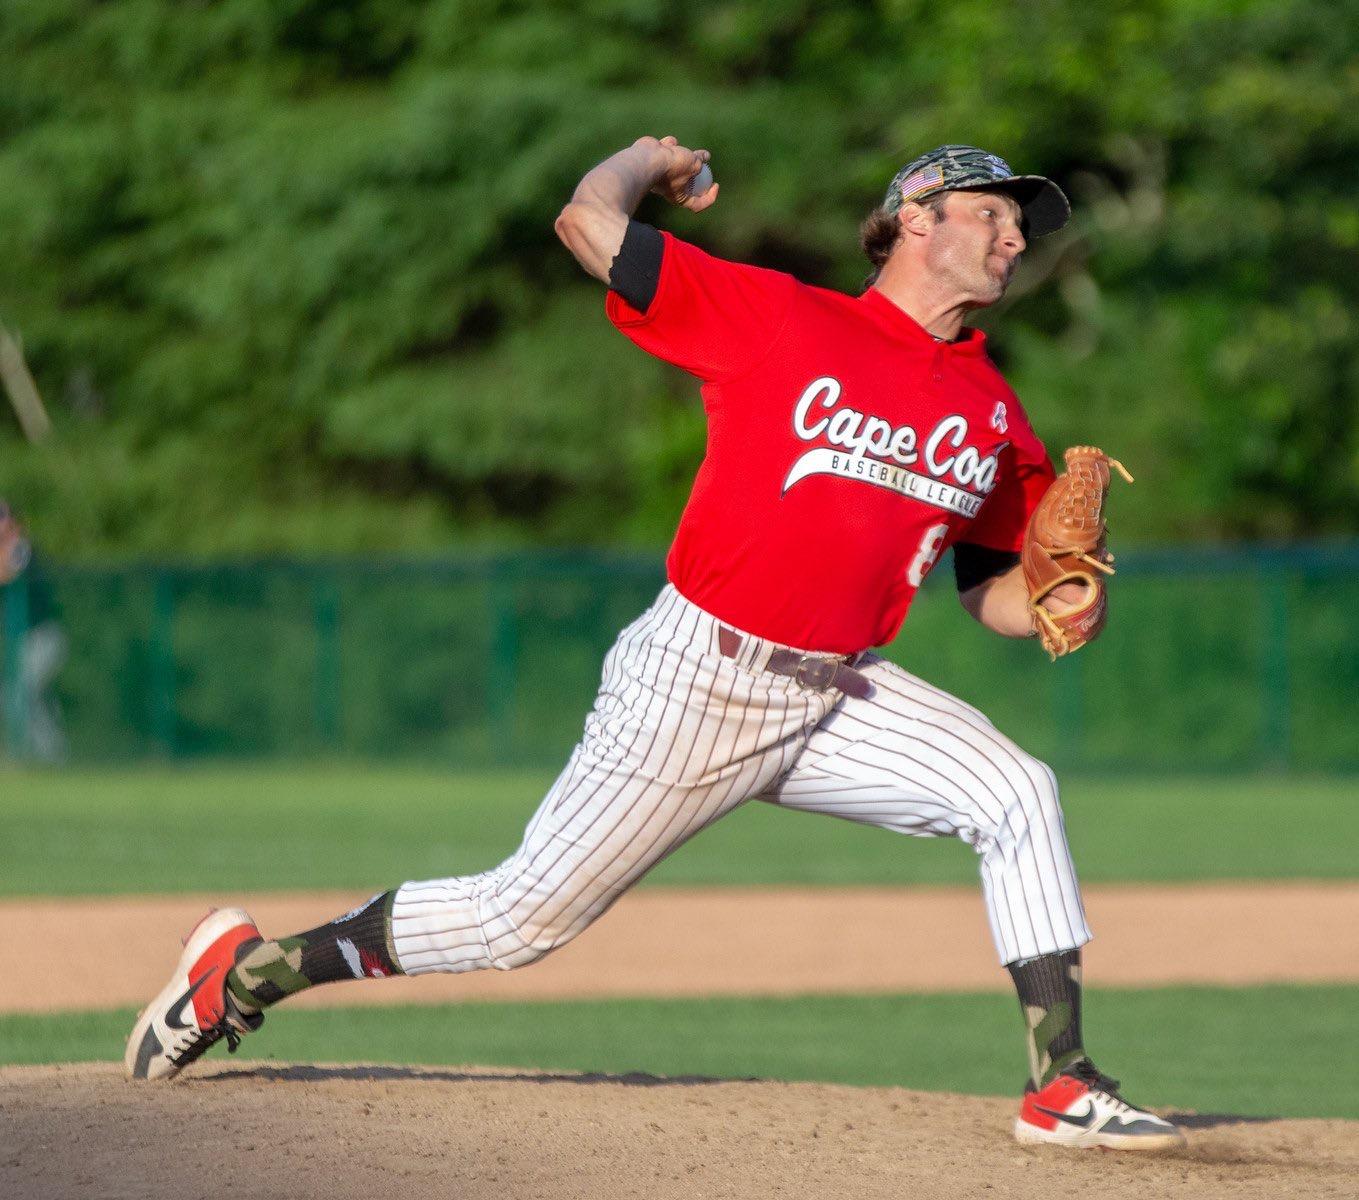 a0058c680d4b9 Cape Cod Baseball League: Weekly Season News